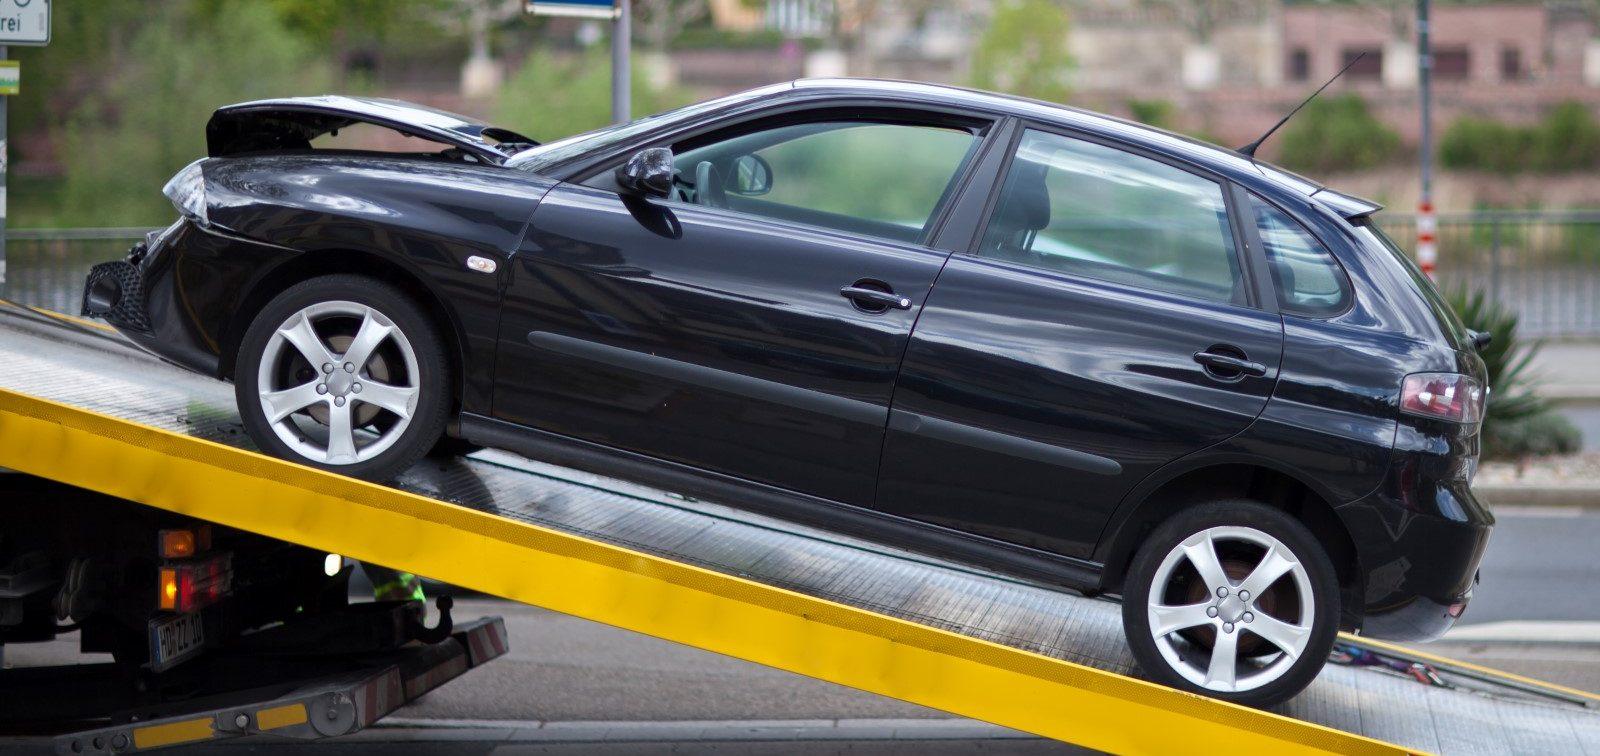 Blown Head Gasket or car not running? | PA Junk Autos | Buying Junk ...